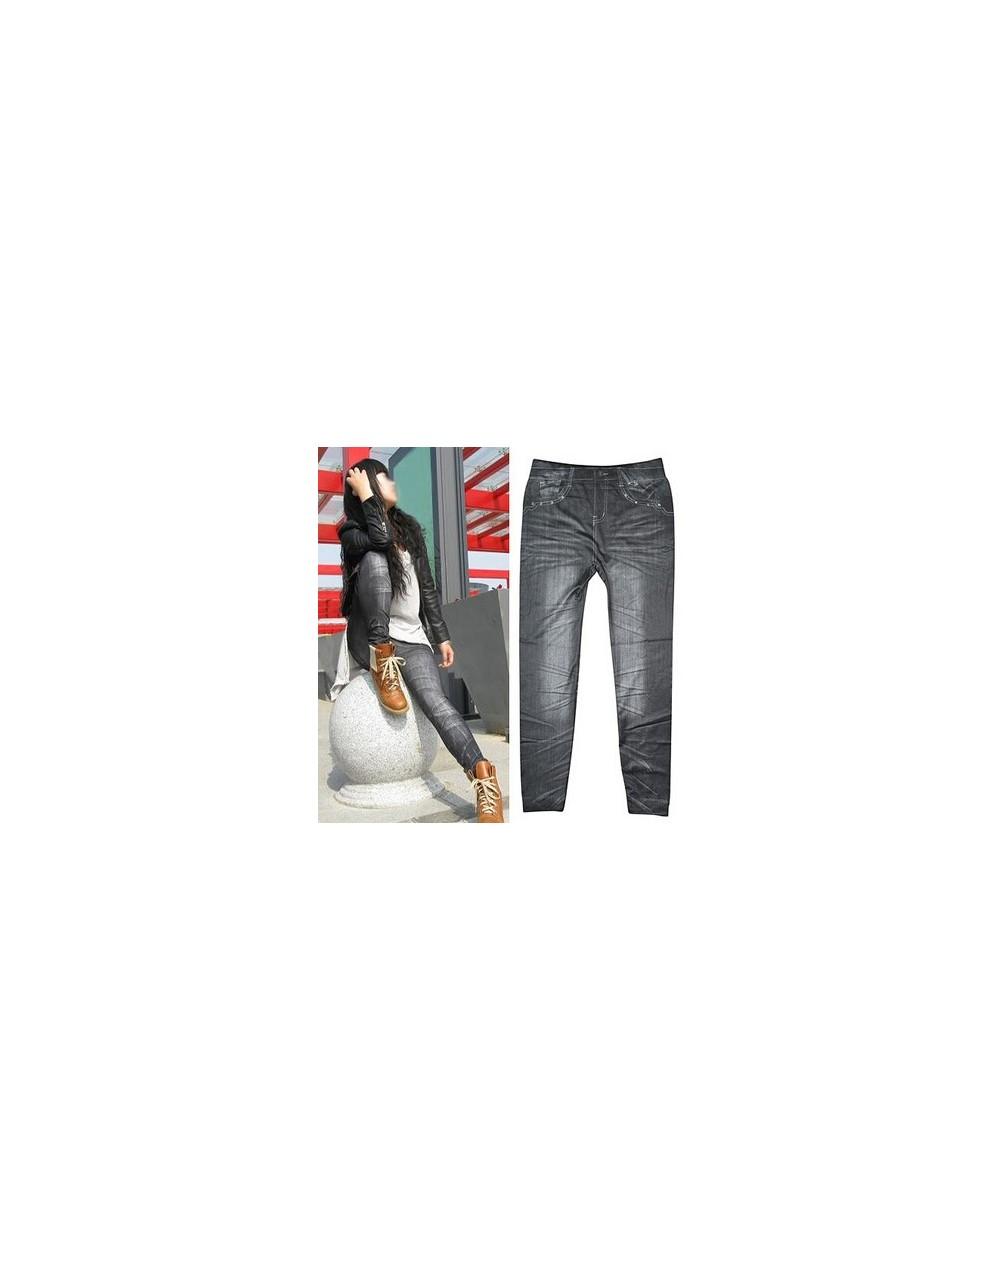 2016 Sales Spring Leggings Jeans Women Denim Pants With Pocket Slim Jeggings Fitness Plus Size Leggings 9 Colors Styles - Be...